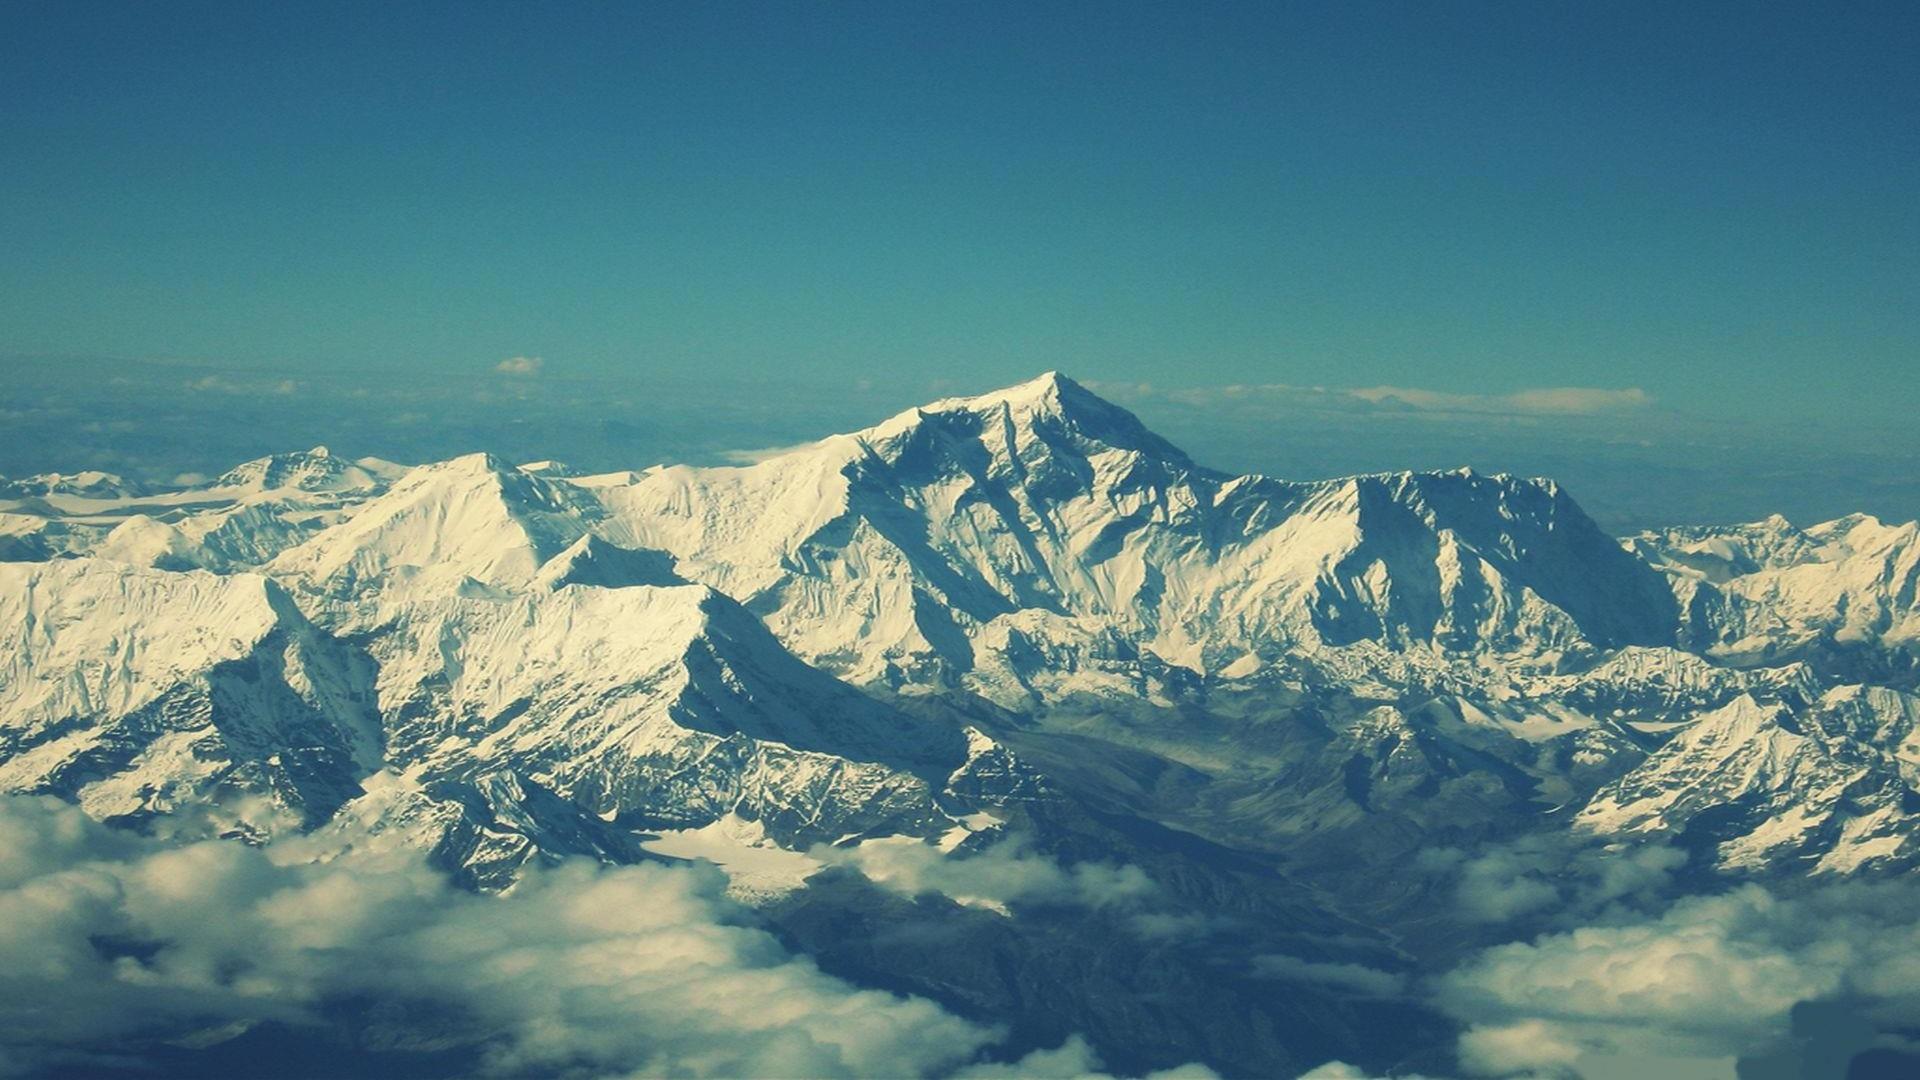 Everest Pic